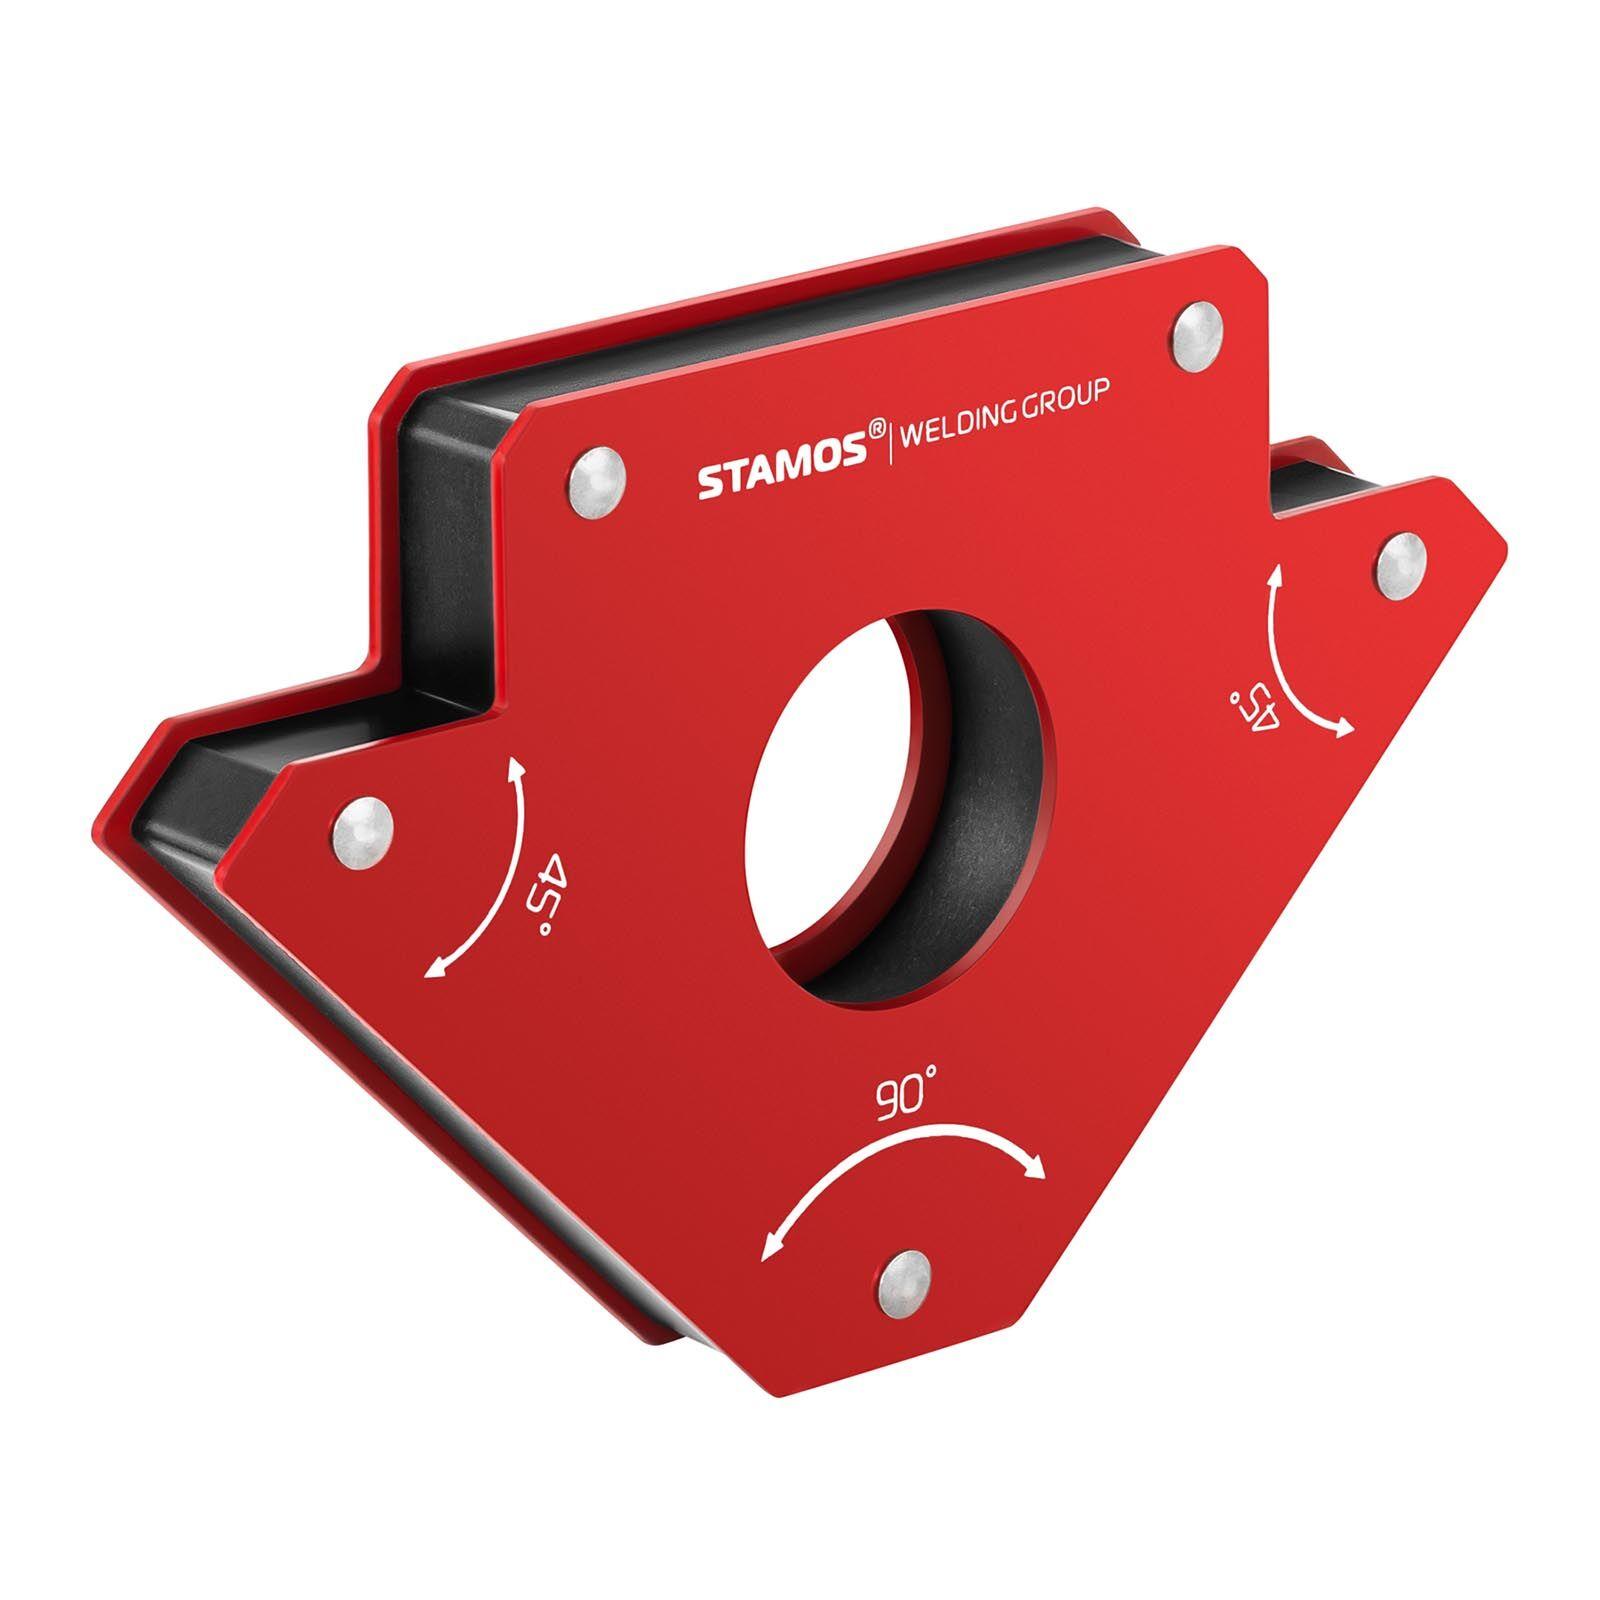 stamos welding group supporto magnetico per saldatura - set da 2 pezzi - 19 x 12 x 2,4 cm swg-mwh-l